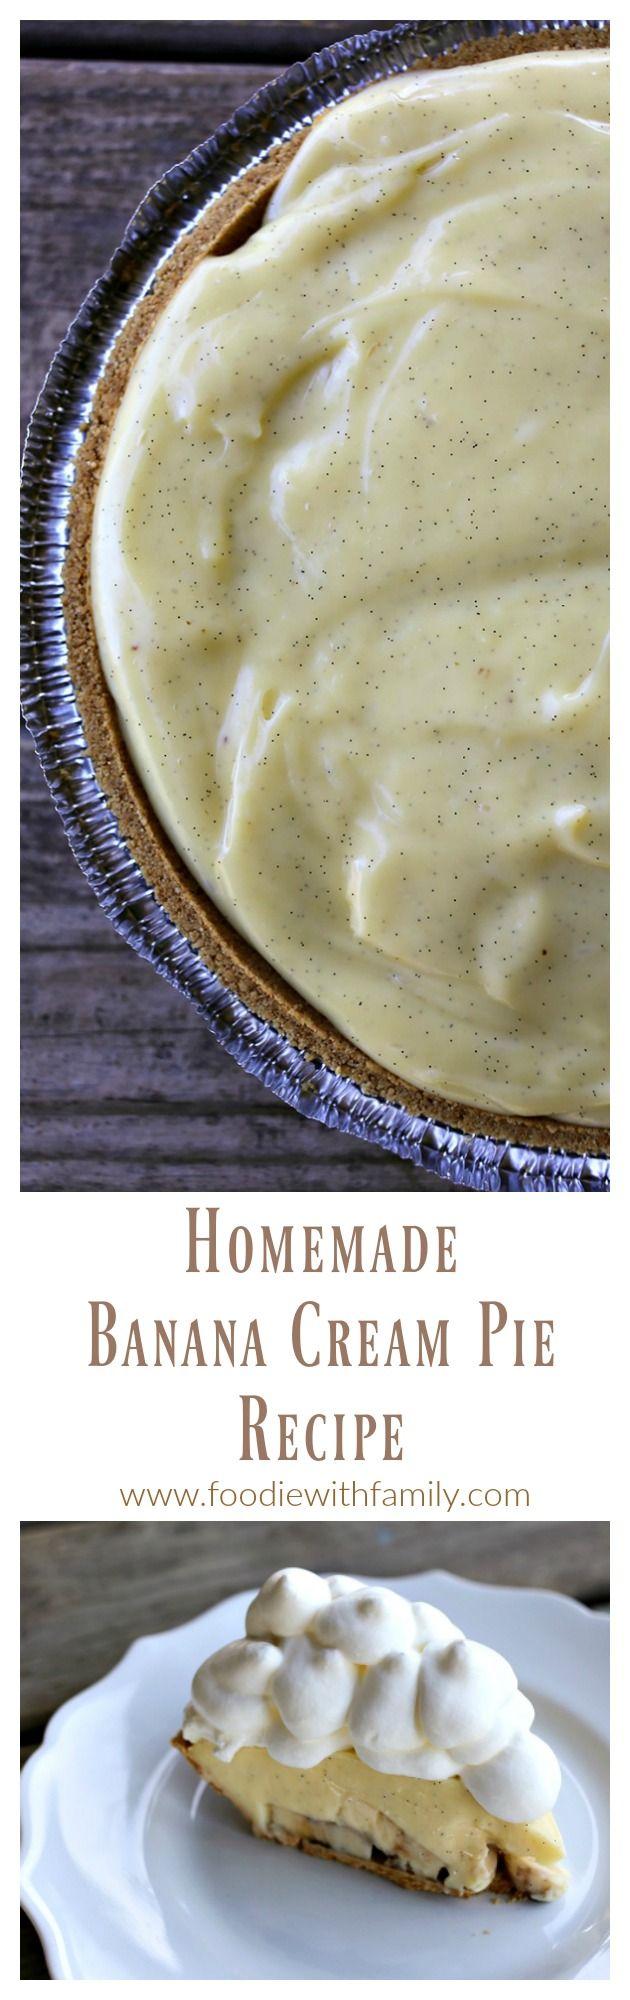 Homemade Banana Cream Pie with real bananas and homemade vanilla bean custard.